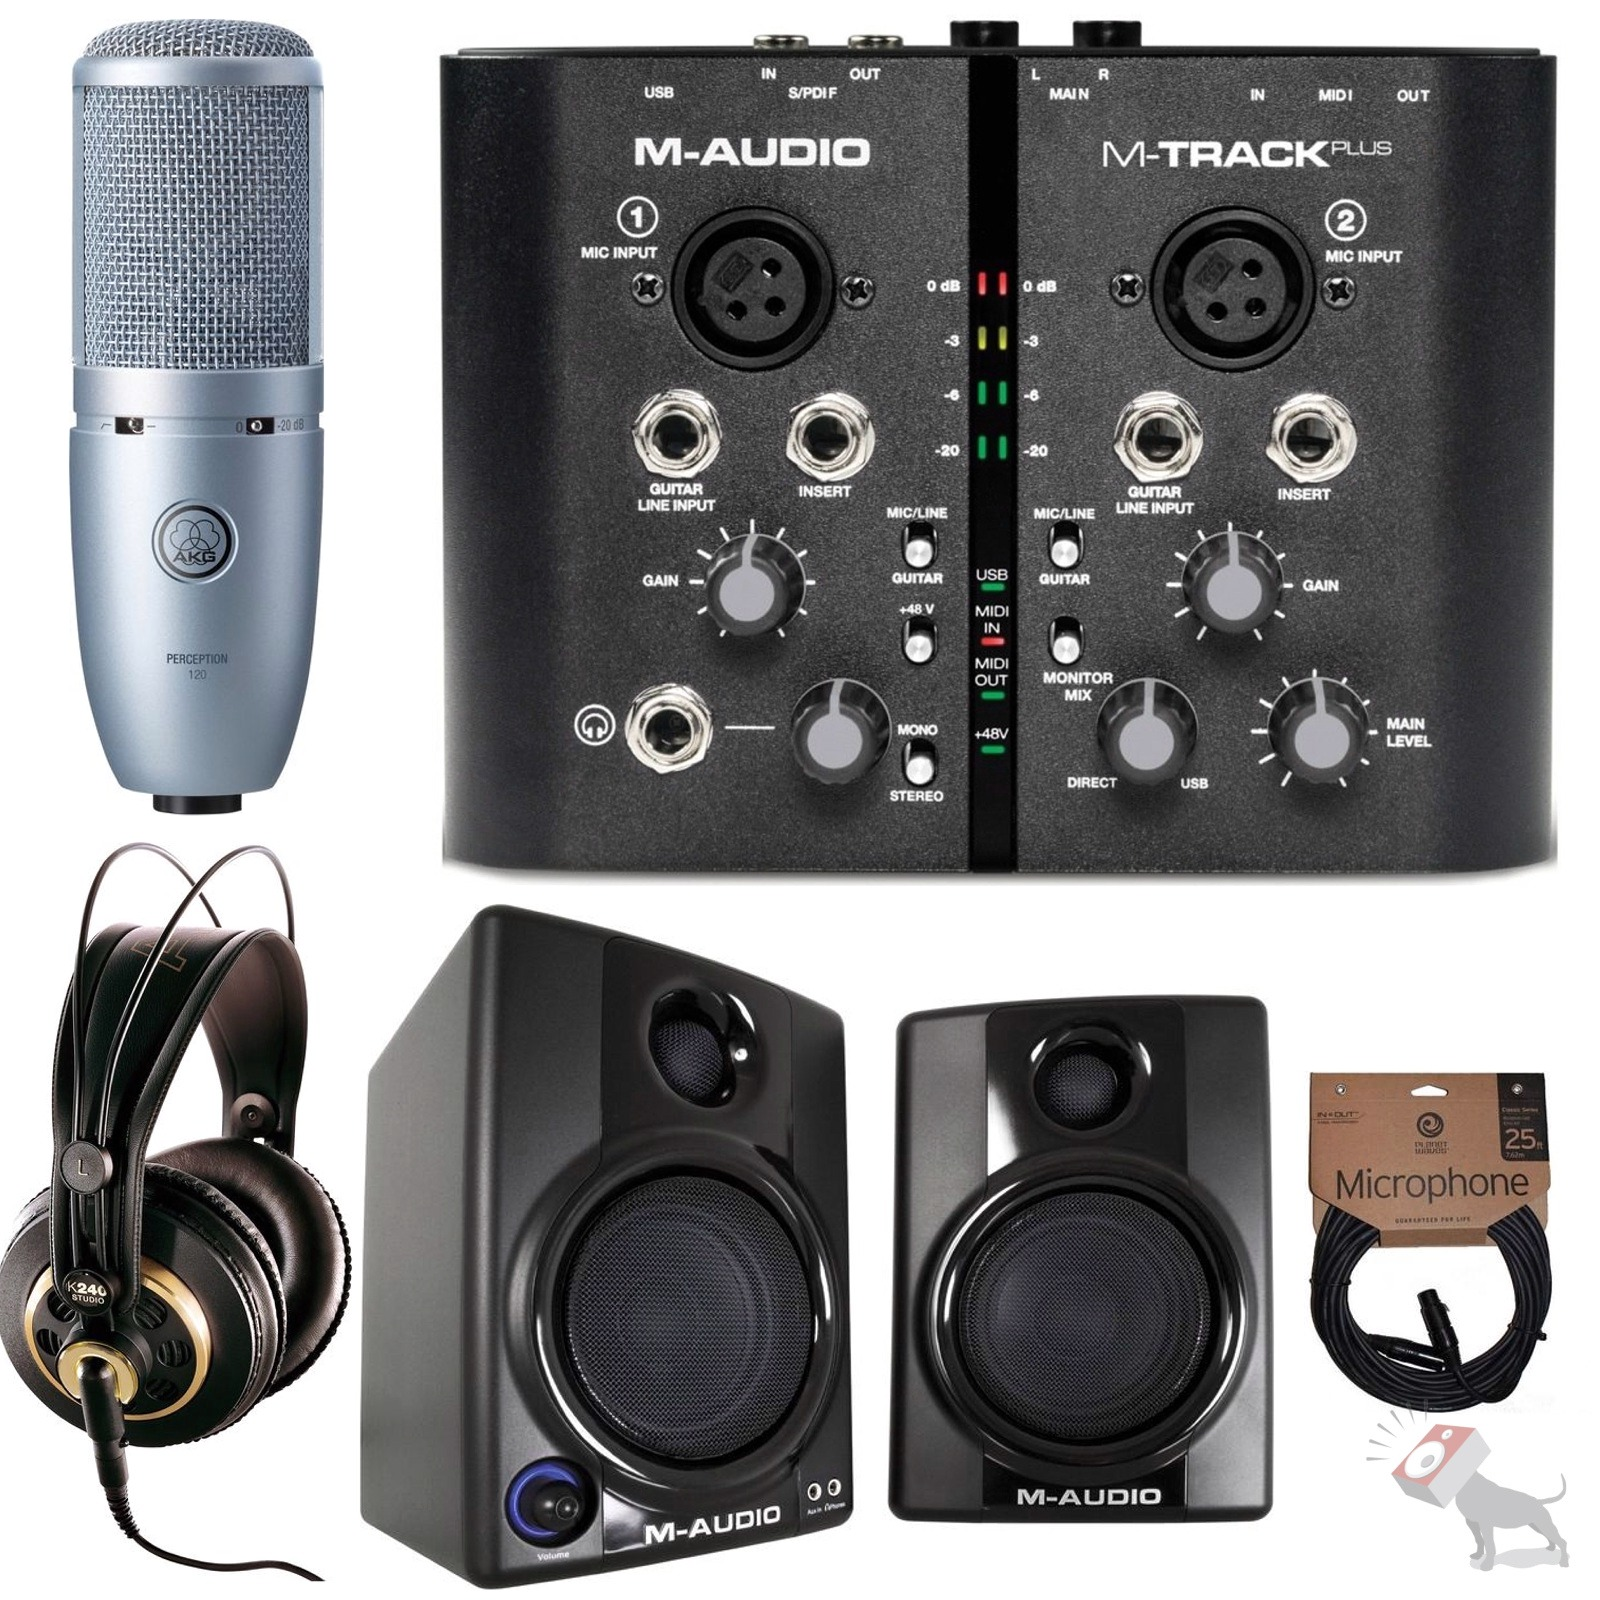 m audio m track plus w pro tools av30 monitors akg perception 120 mic k240 ebay. Black Bedroom Furniture Sets. Home Design Ideas